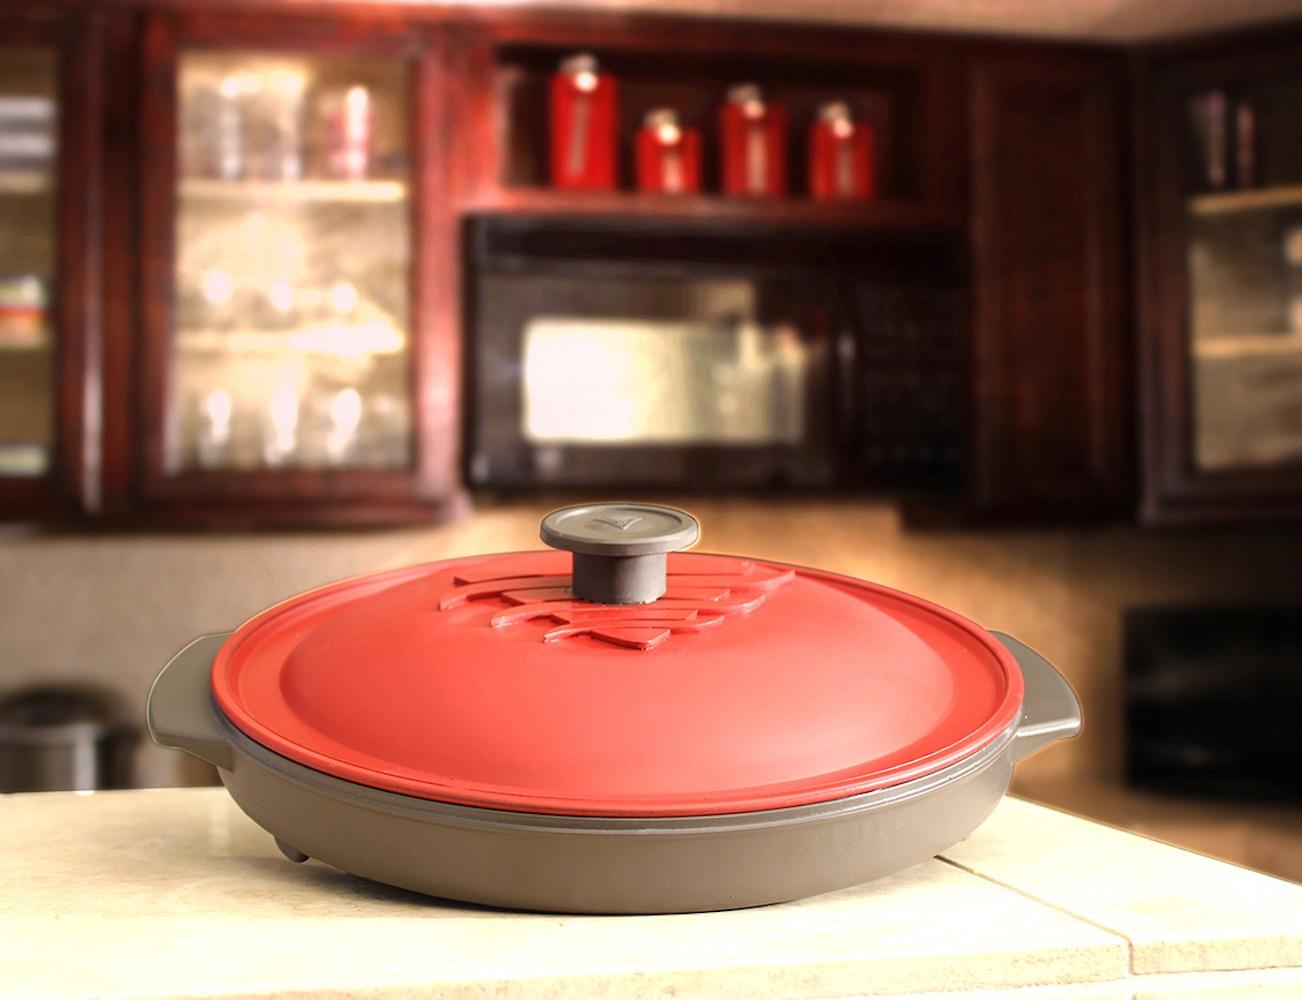 Reheatza+Microwave+Pizza+Pan